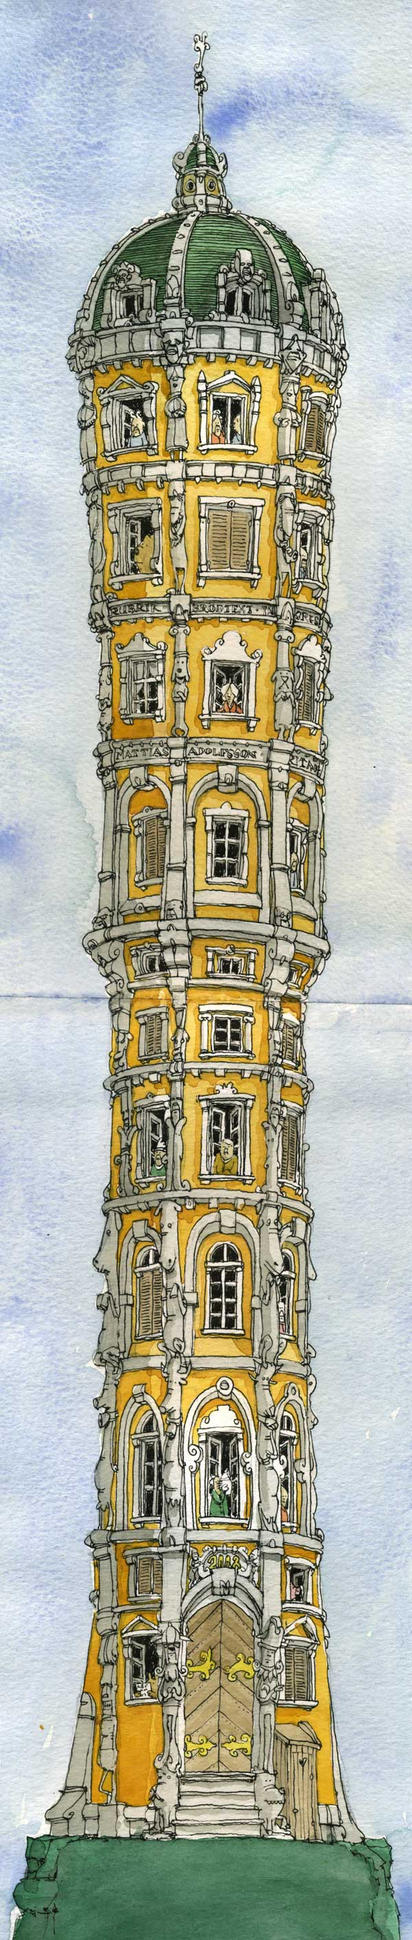 Tallorder by MattiasA